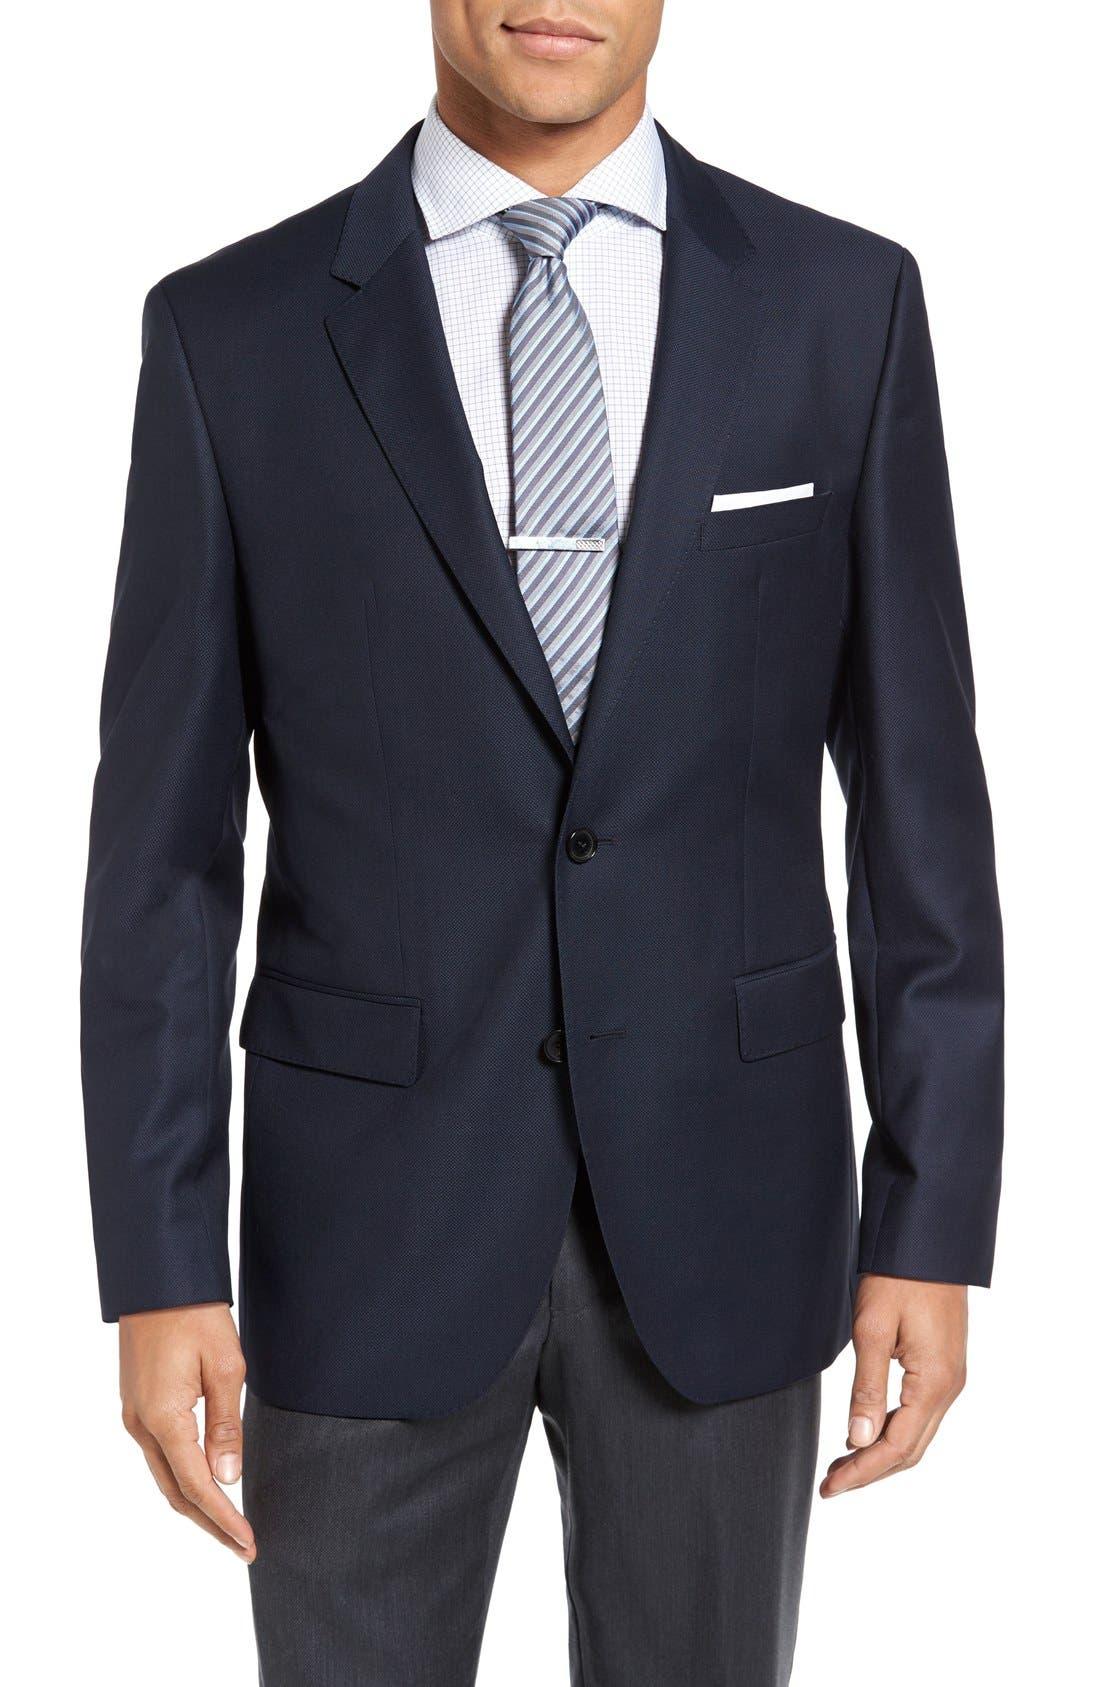 Main Image - BOSS 'James' Trim Fit Wool Blazer